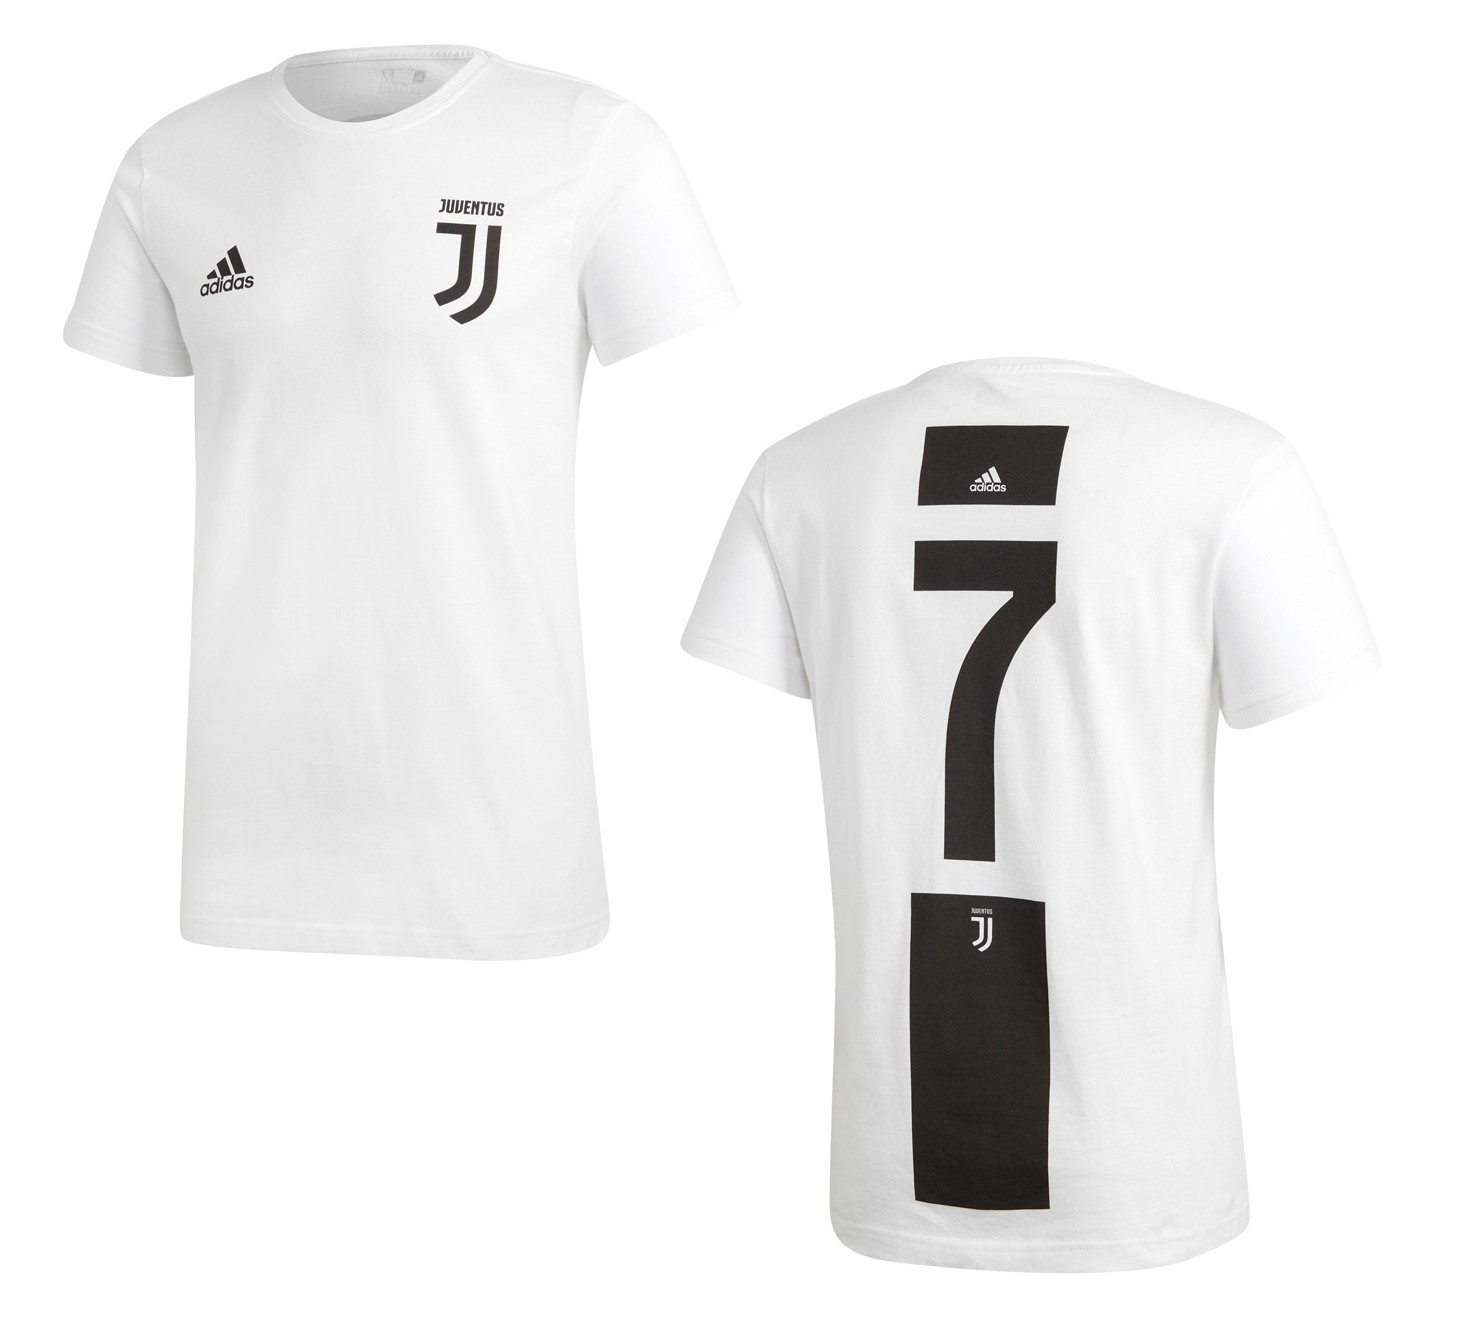 Juventus 7 Ronaldo Graphic t shirt 201819 Adidas